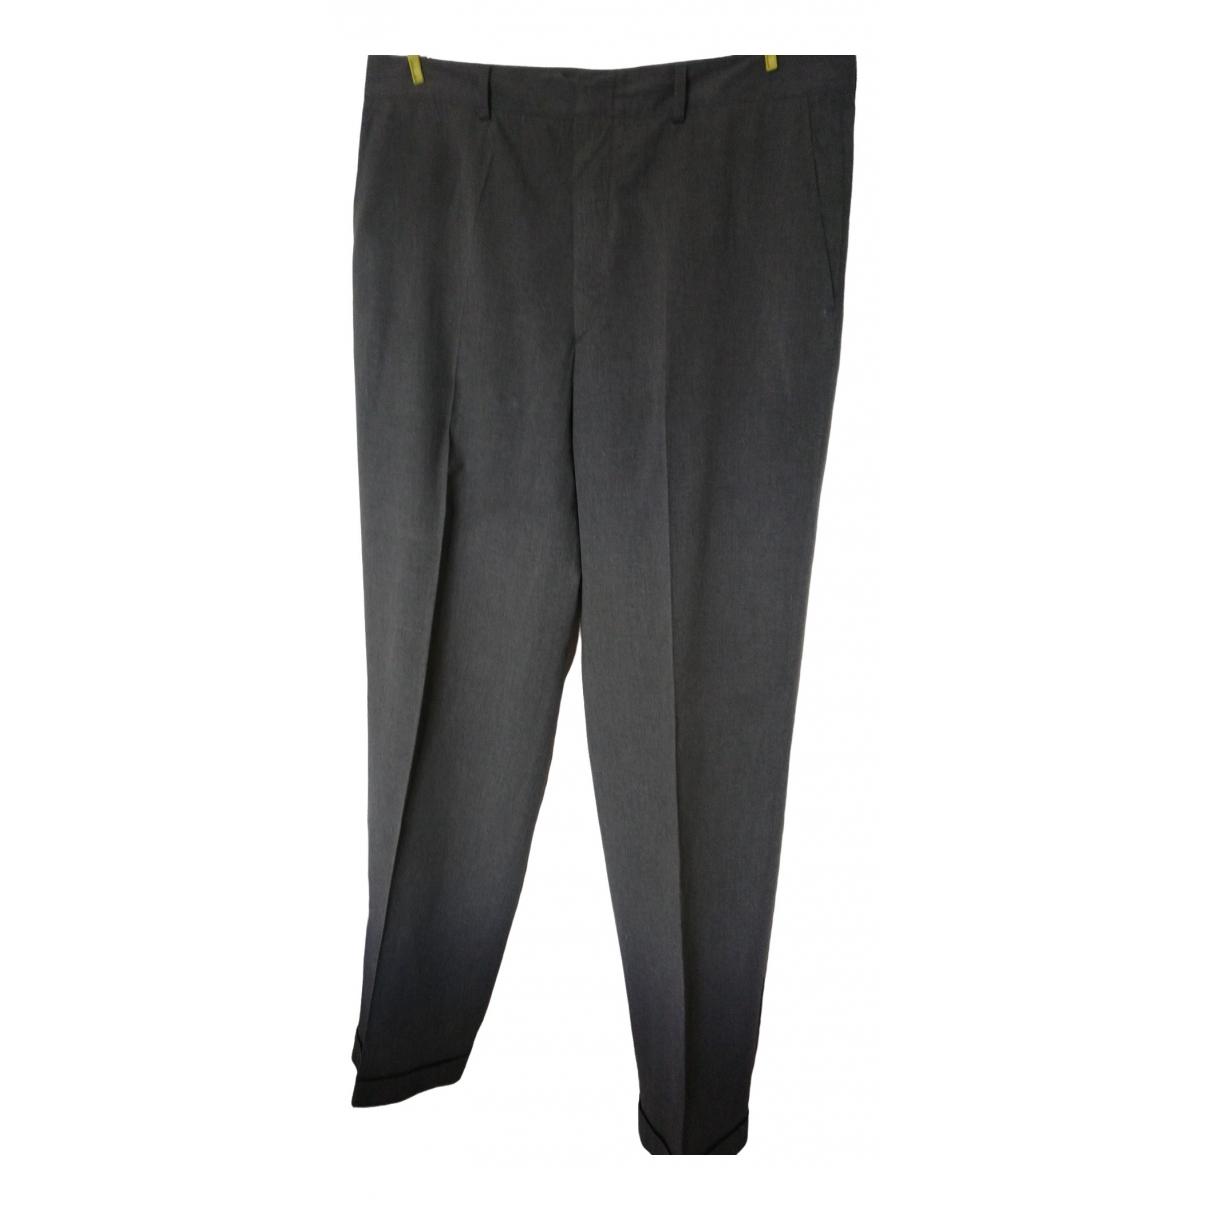 Cerruti \N Grey Cotton Trousers for Men 54 IT